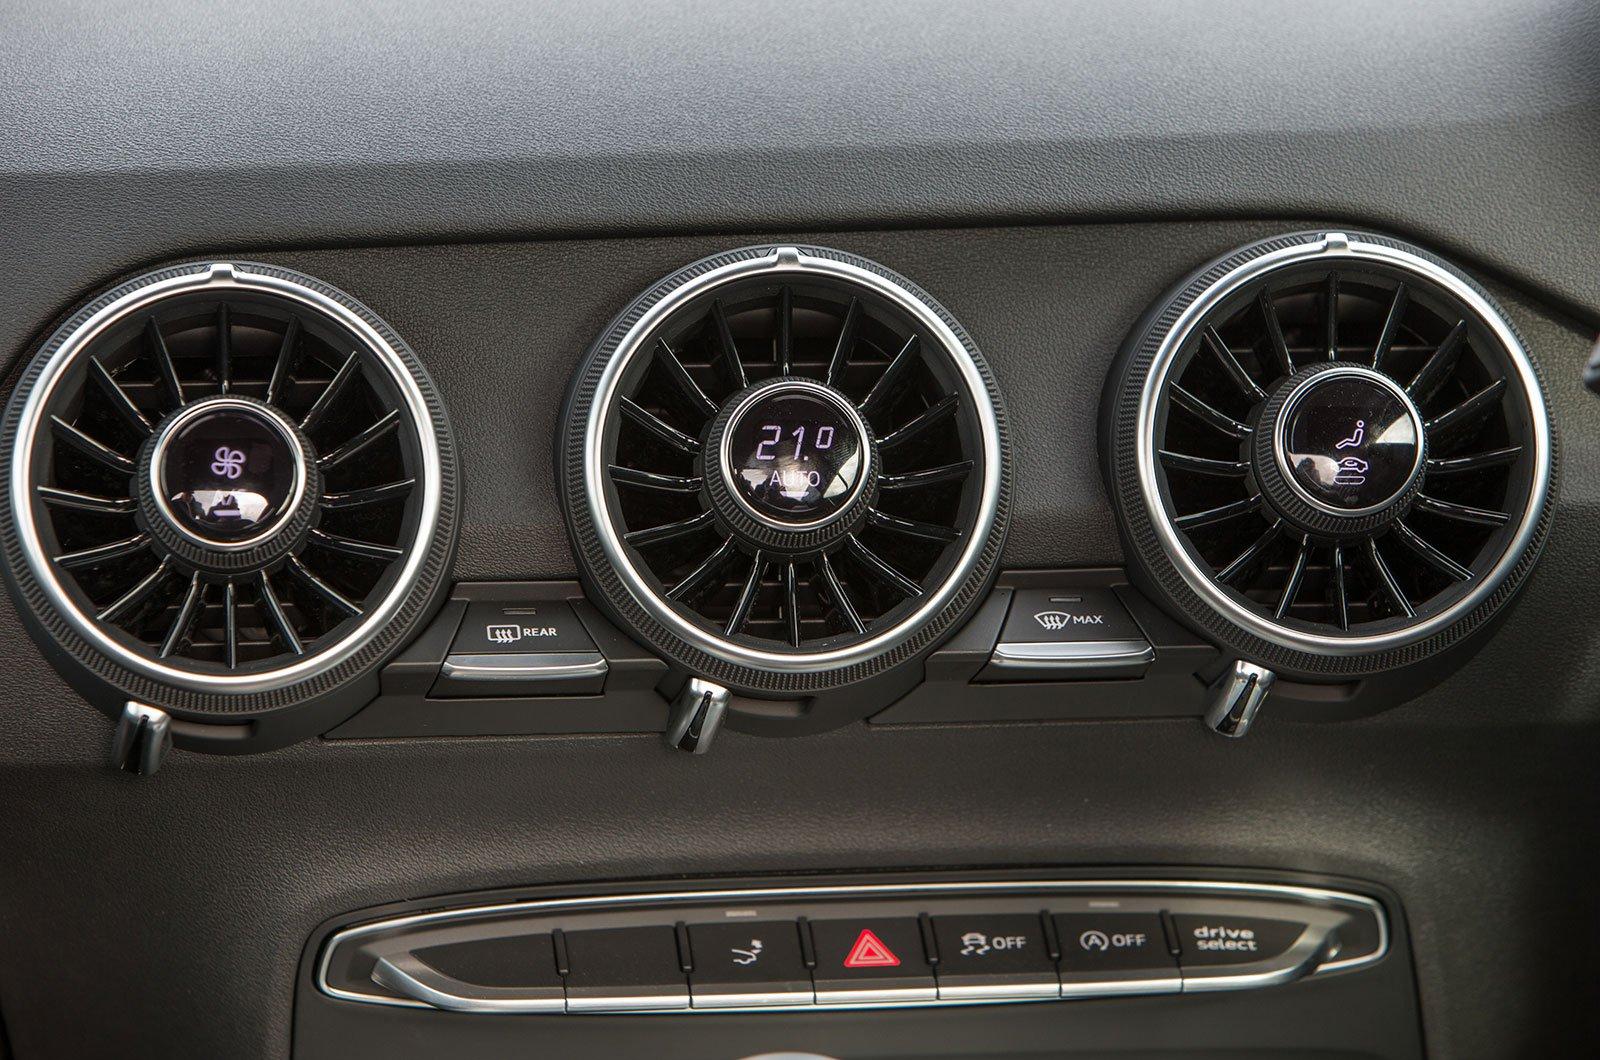 Audi TT climate controls